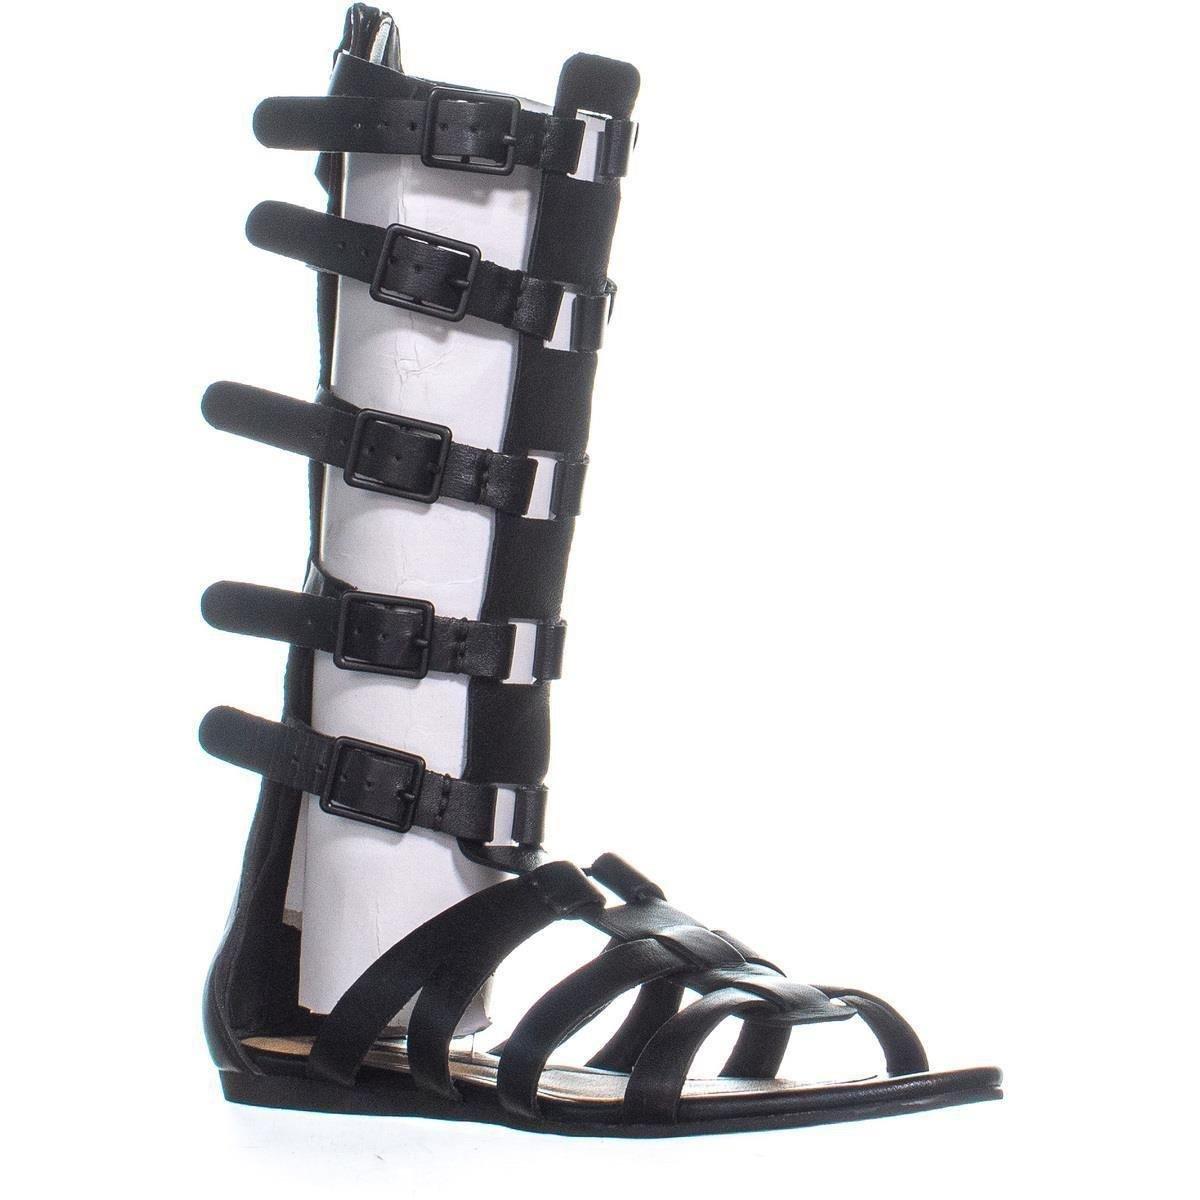 e3febcd0240 Lyst - Kensie Stellar Gladiator Sandals in Black - Save 13%